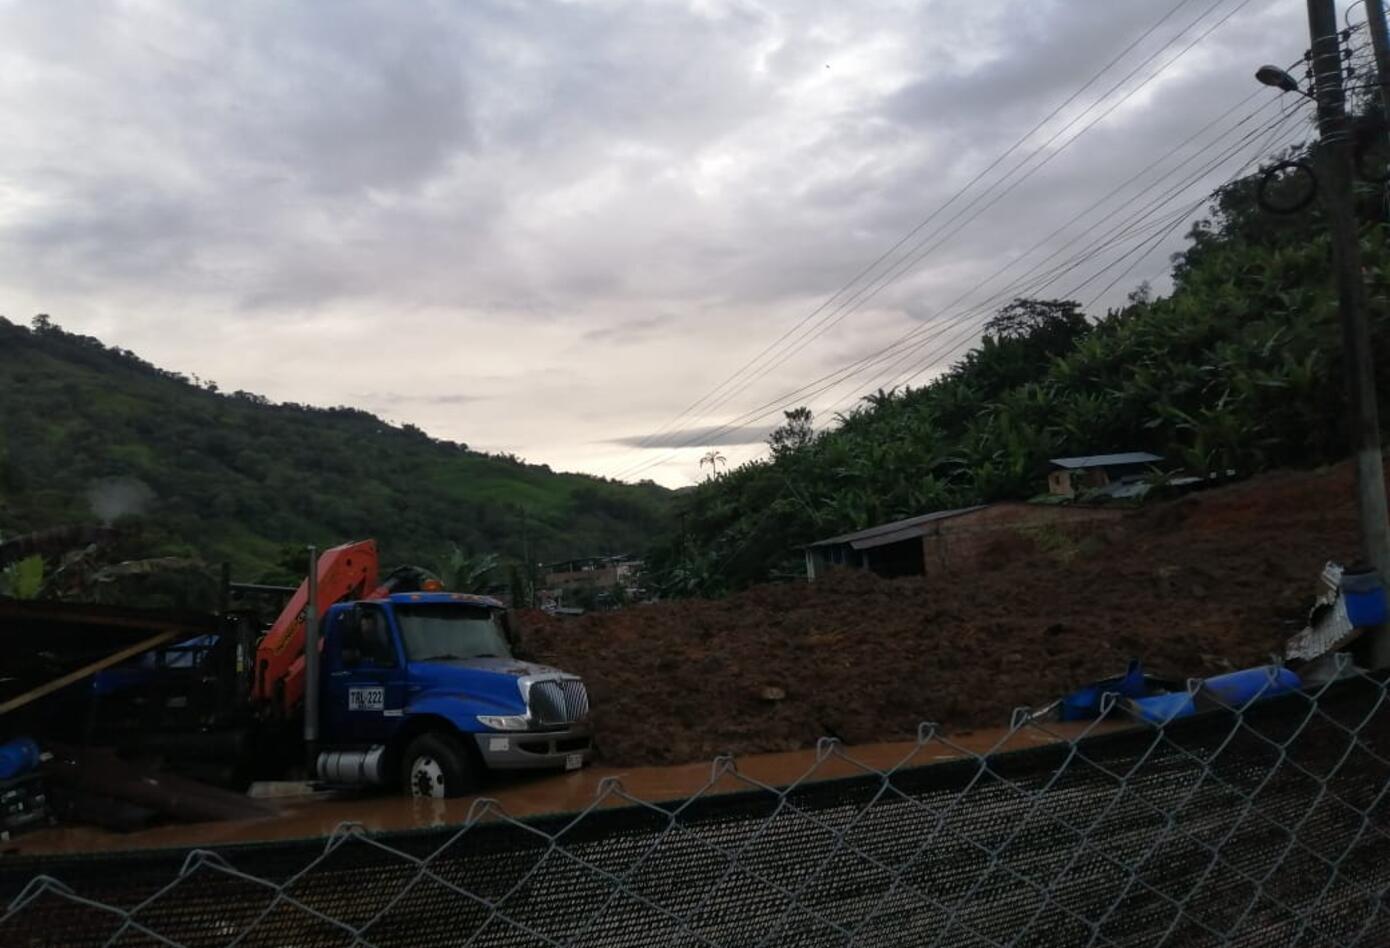 25 familias fueron evacuadas de manera preventiva